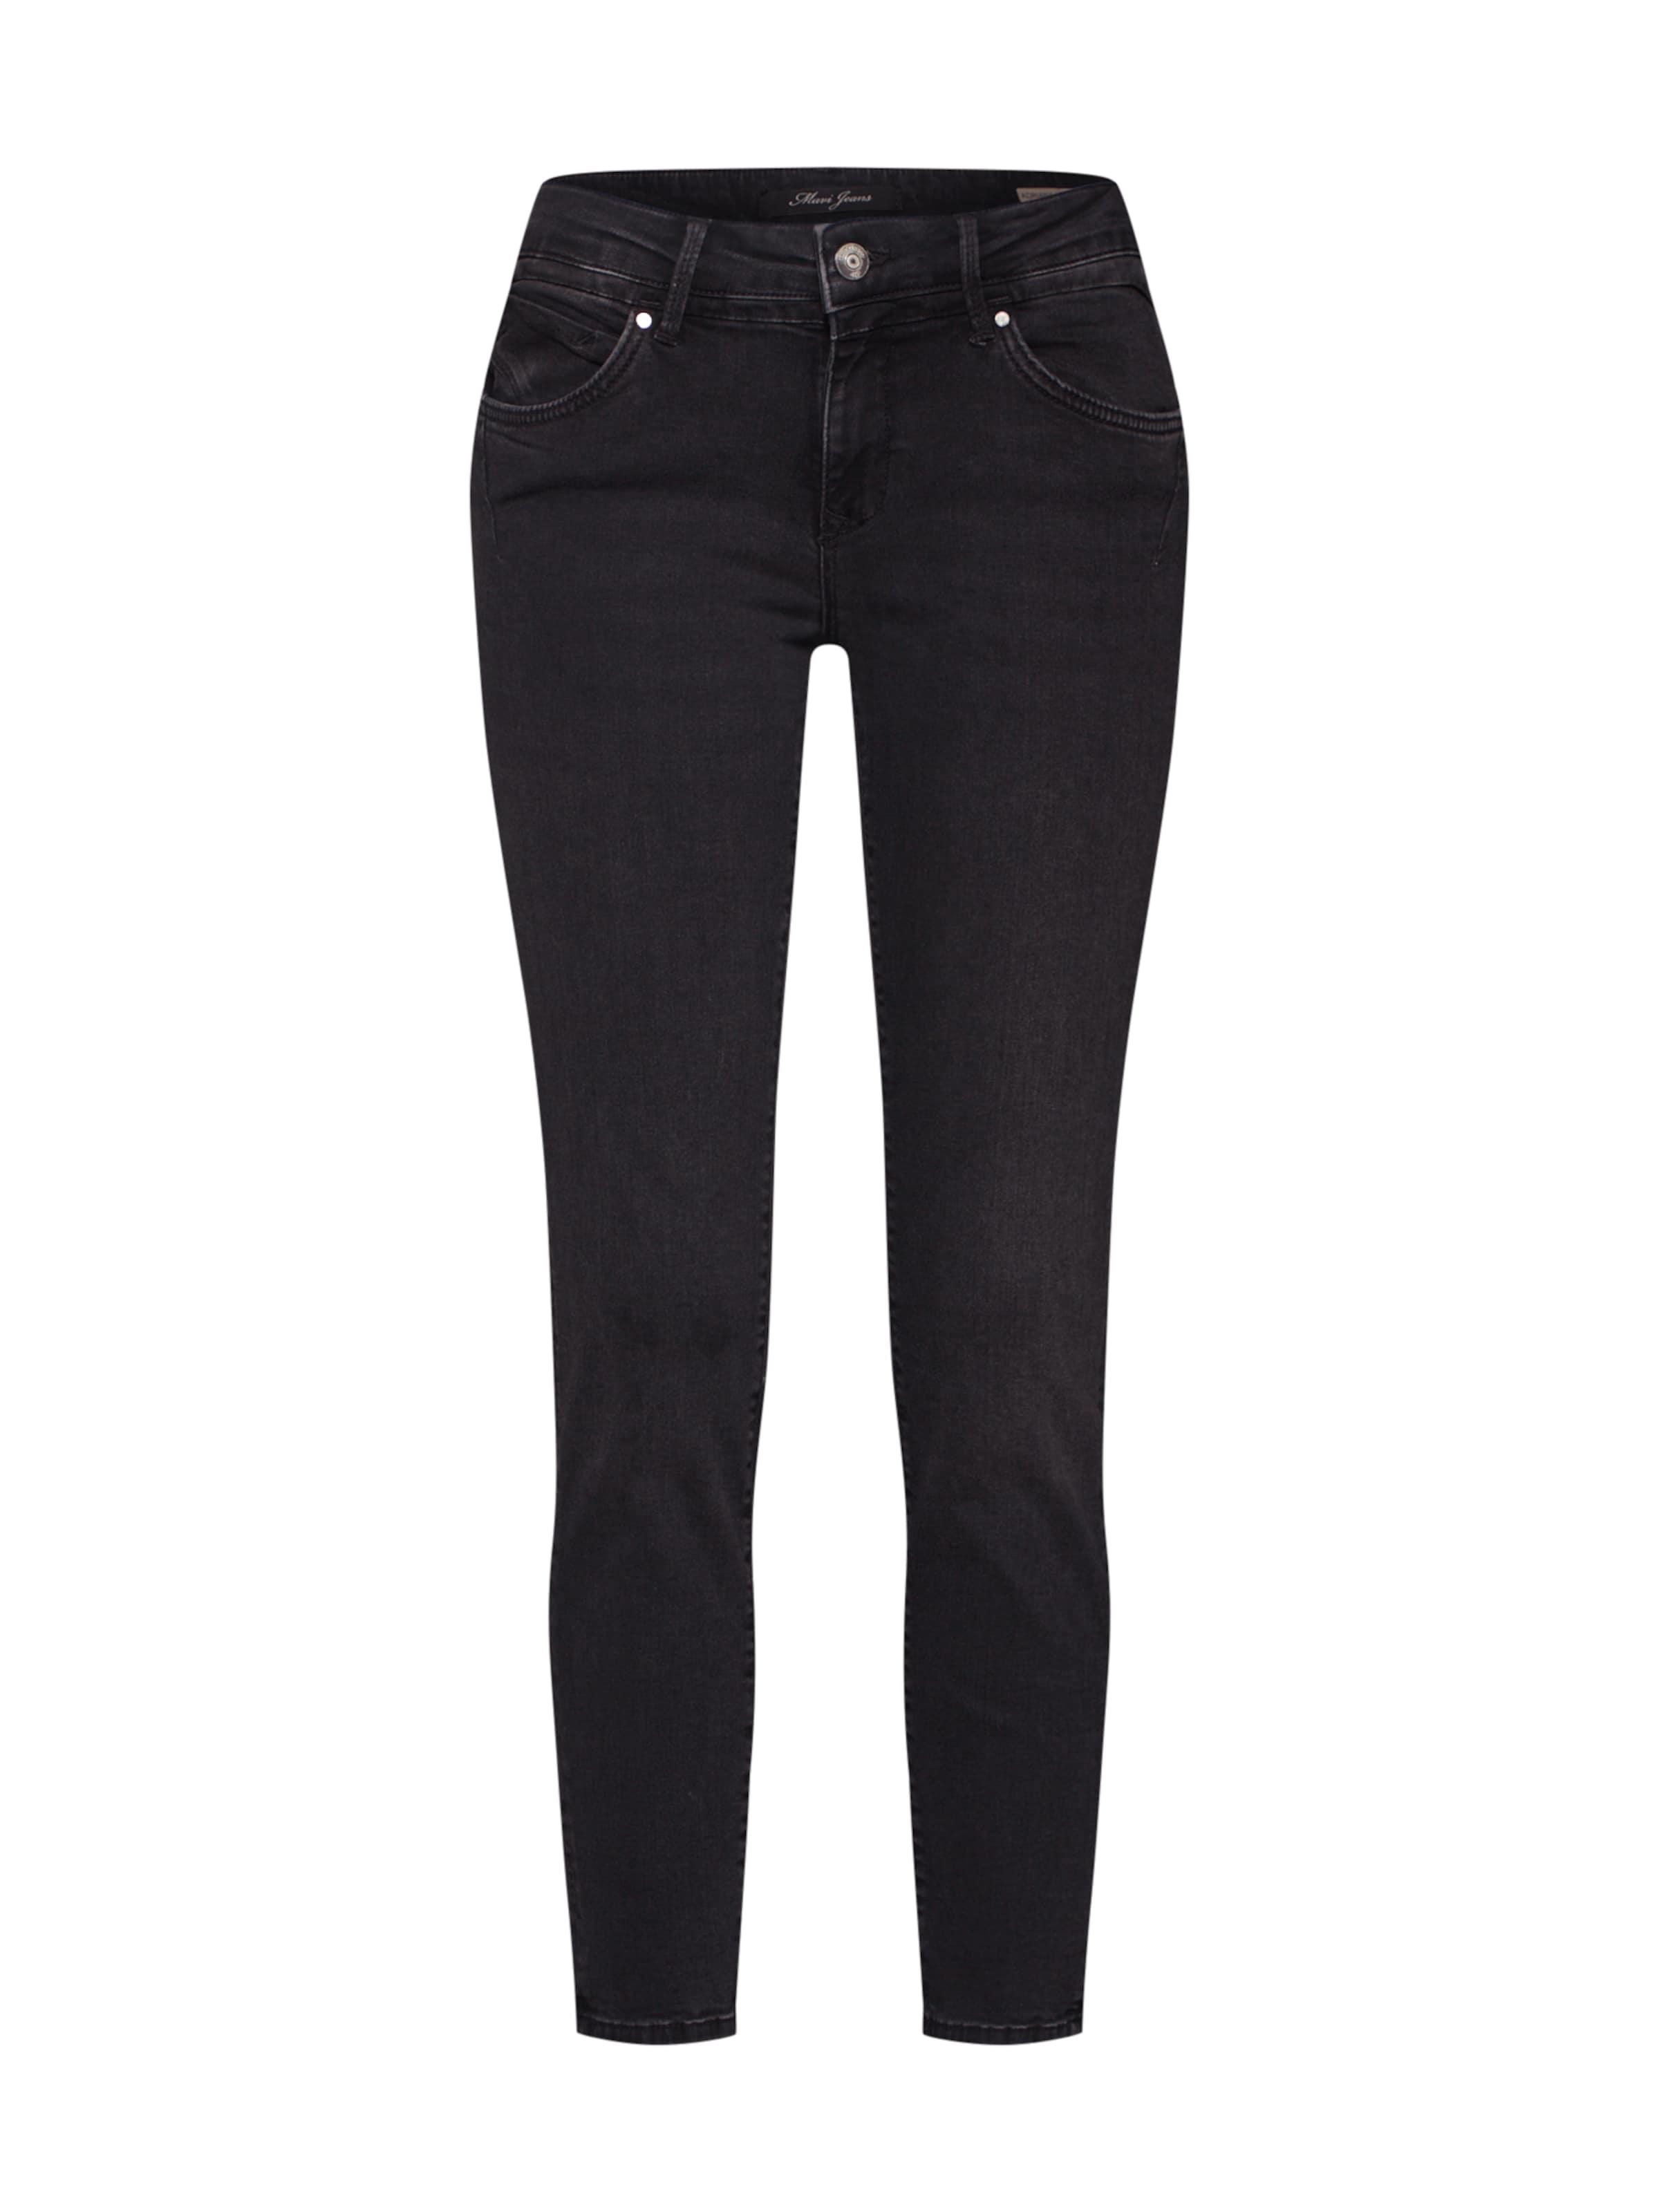 Denim Jeans Black Mavi 'adriana' In 9bD2eWEHIY